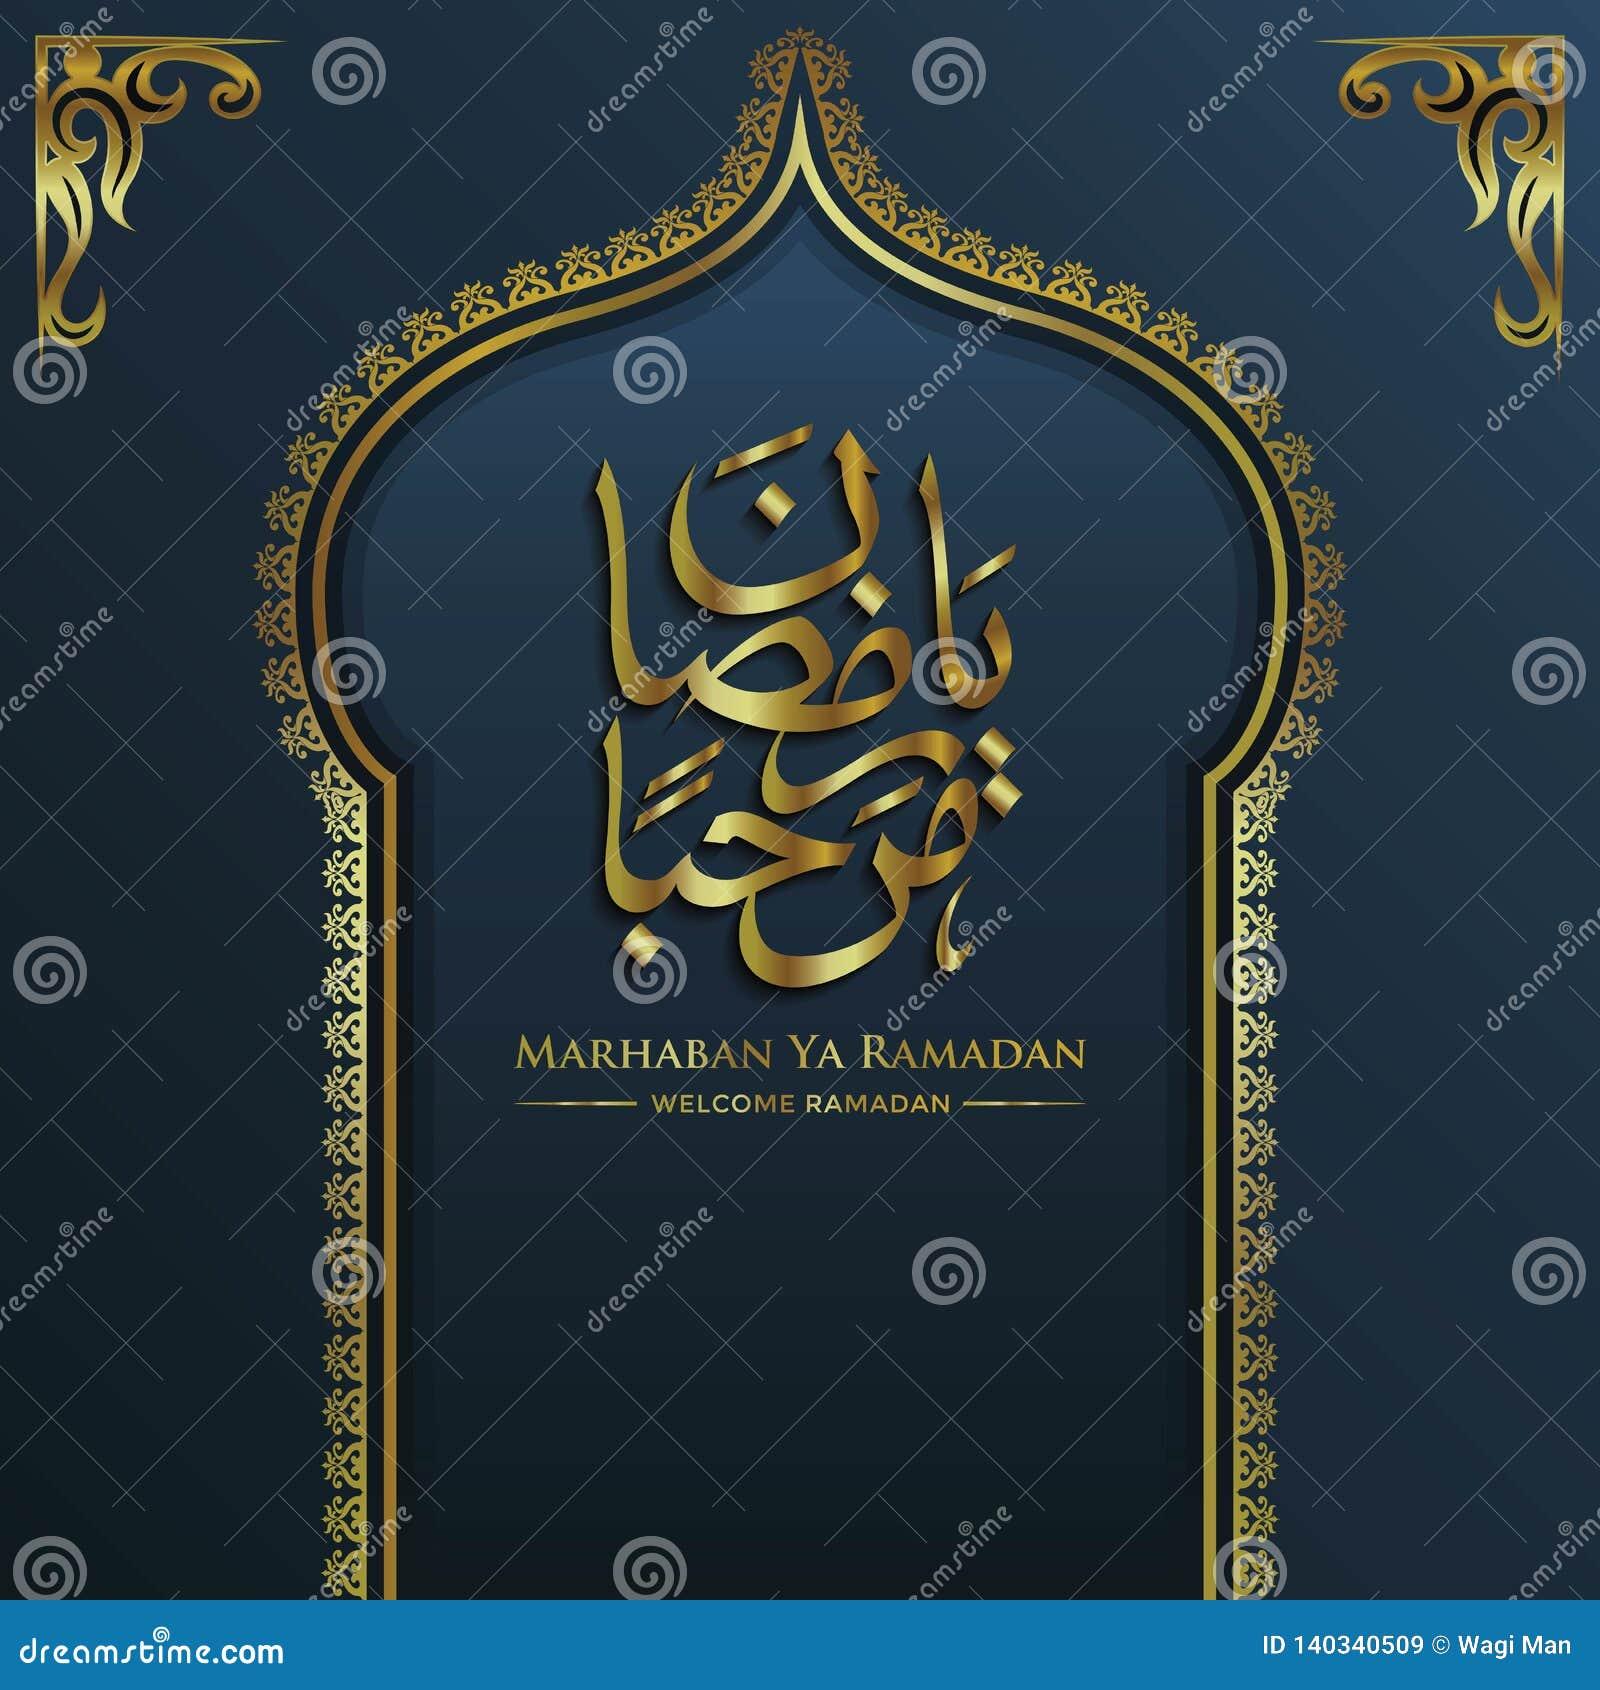 Ramadan Greeting Background, Marhaban Ya Ramadan Stock